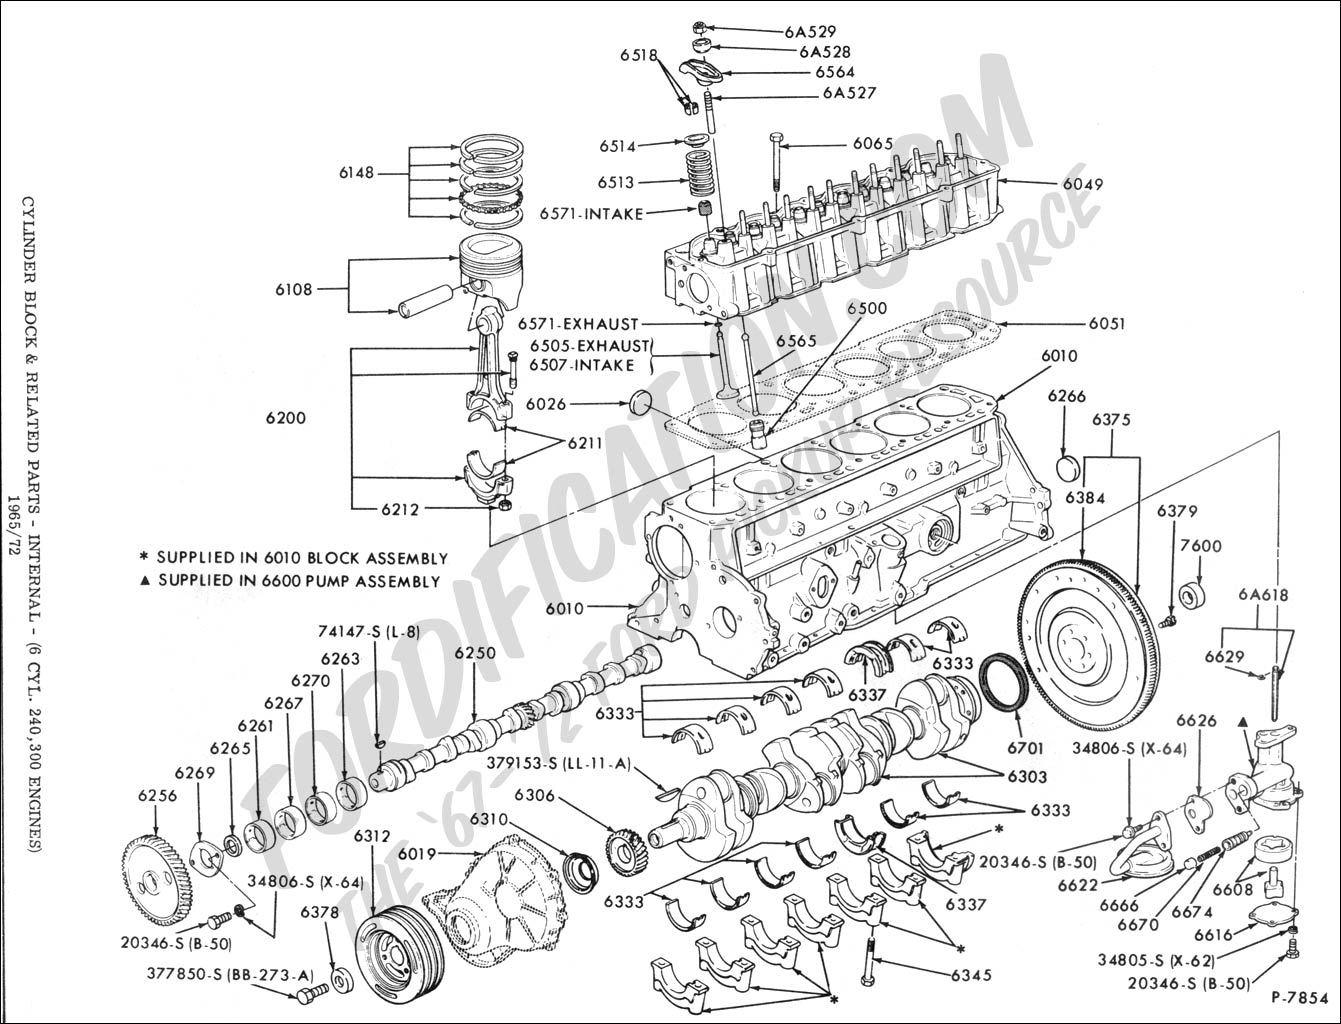 ford 6 cylinder engine diagram - wiring diagram schema zone-track -  zone-track.atmosphereconcept.it  atmosphereconcept.it